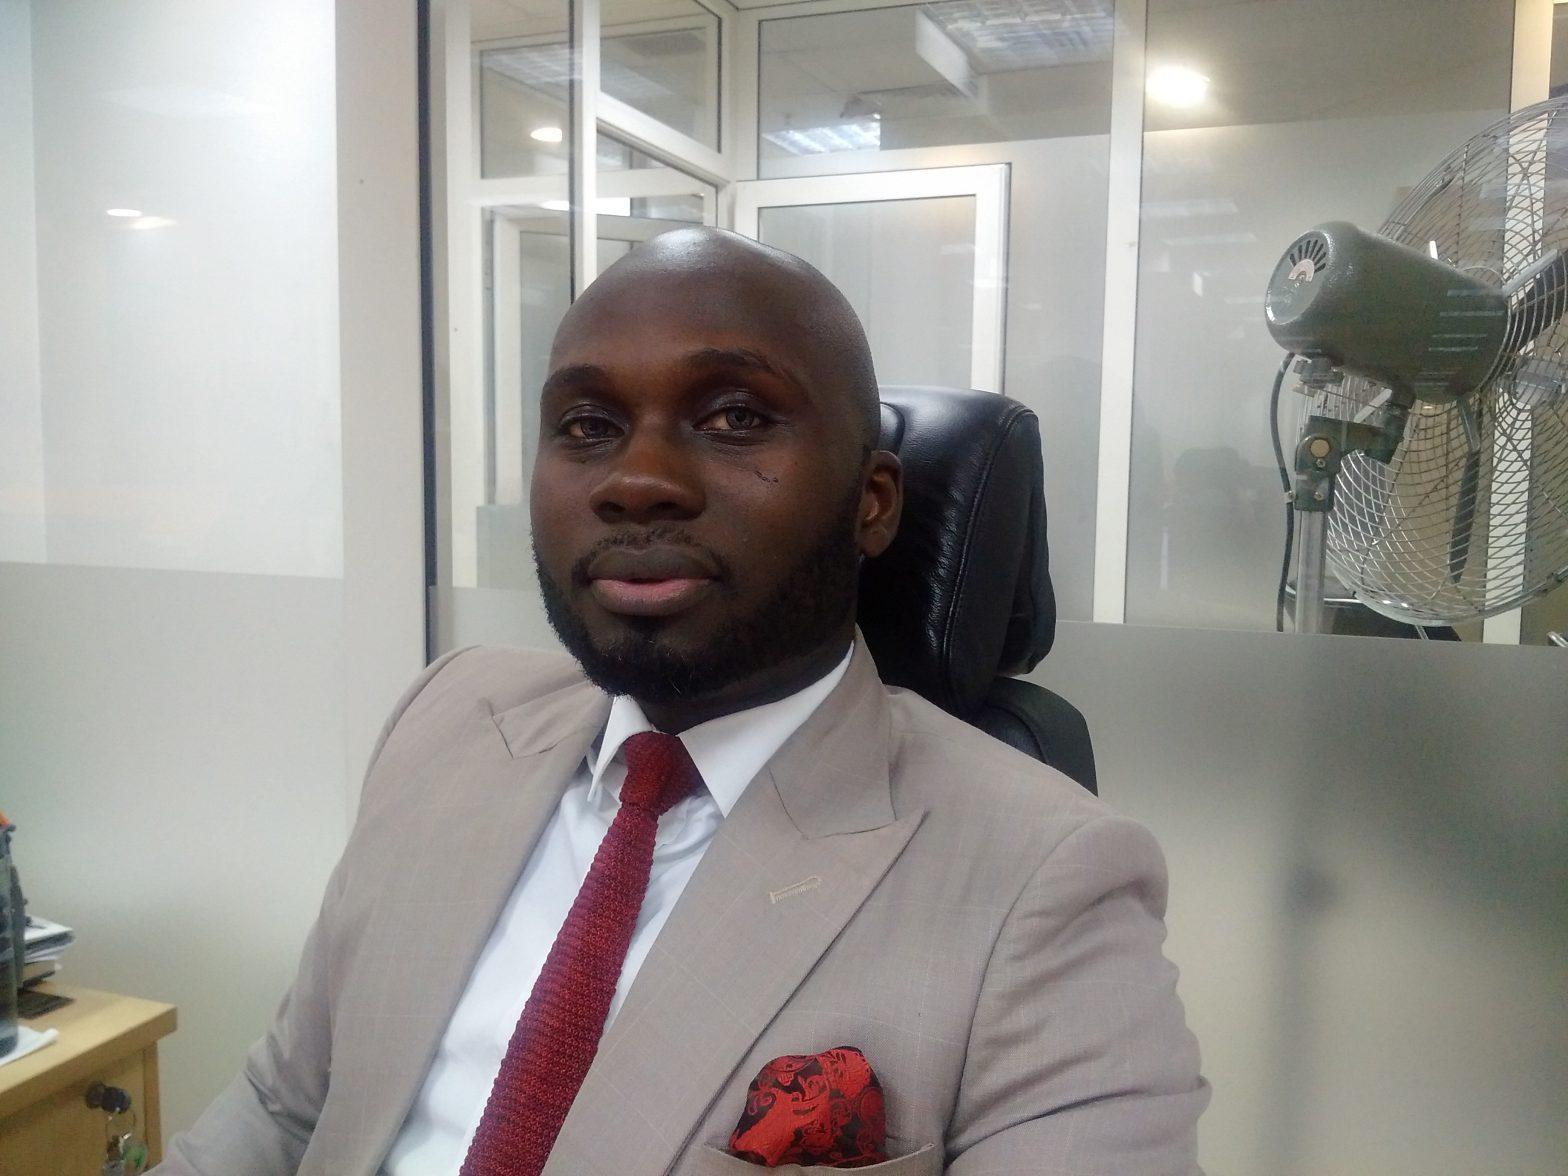 Meet Israel Koledowo, our Brand New Head of Finance for Africa